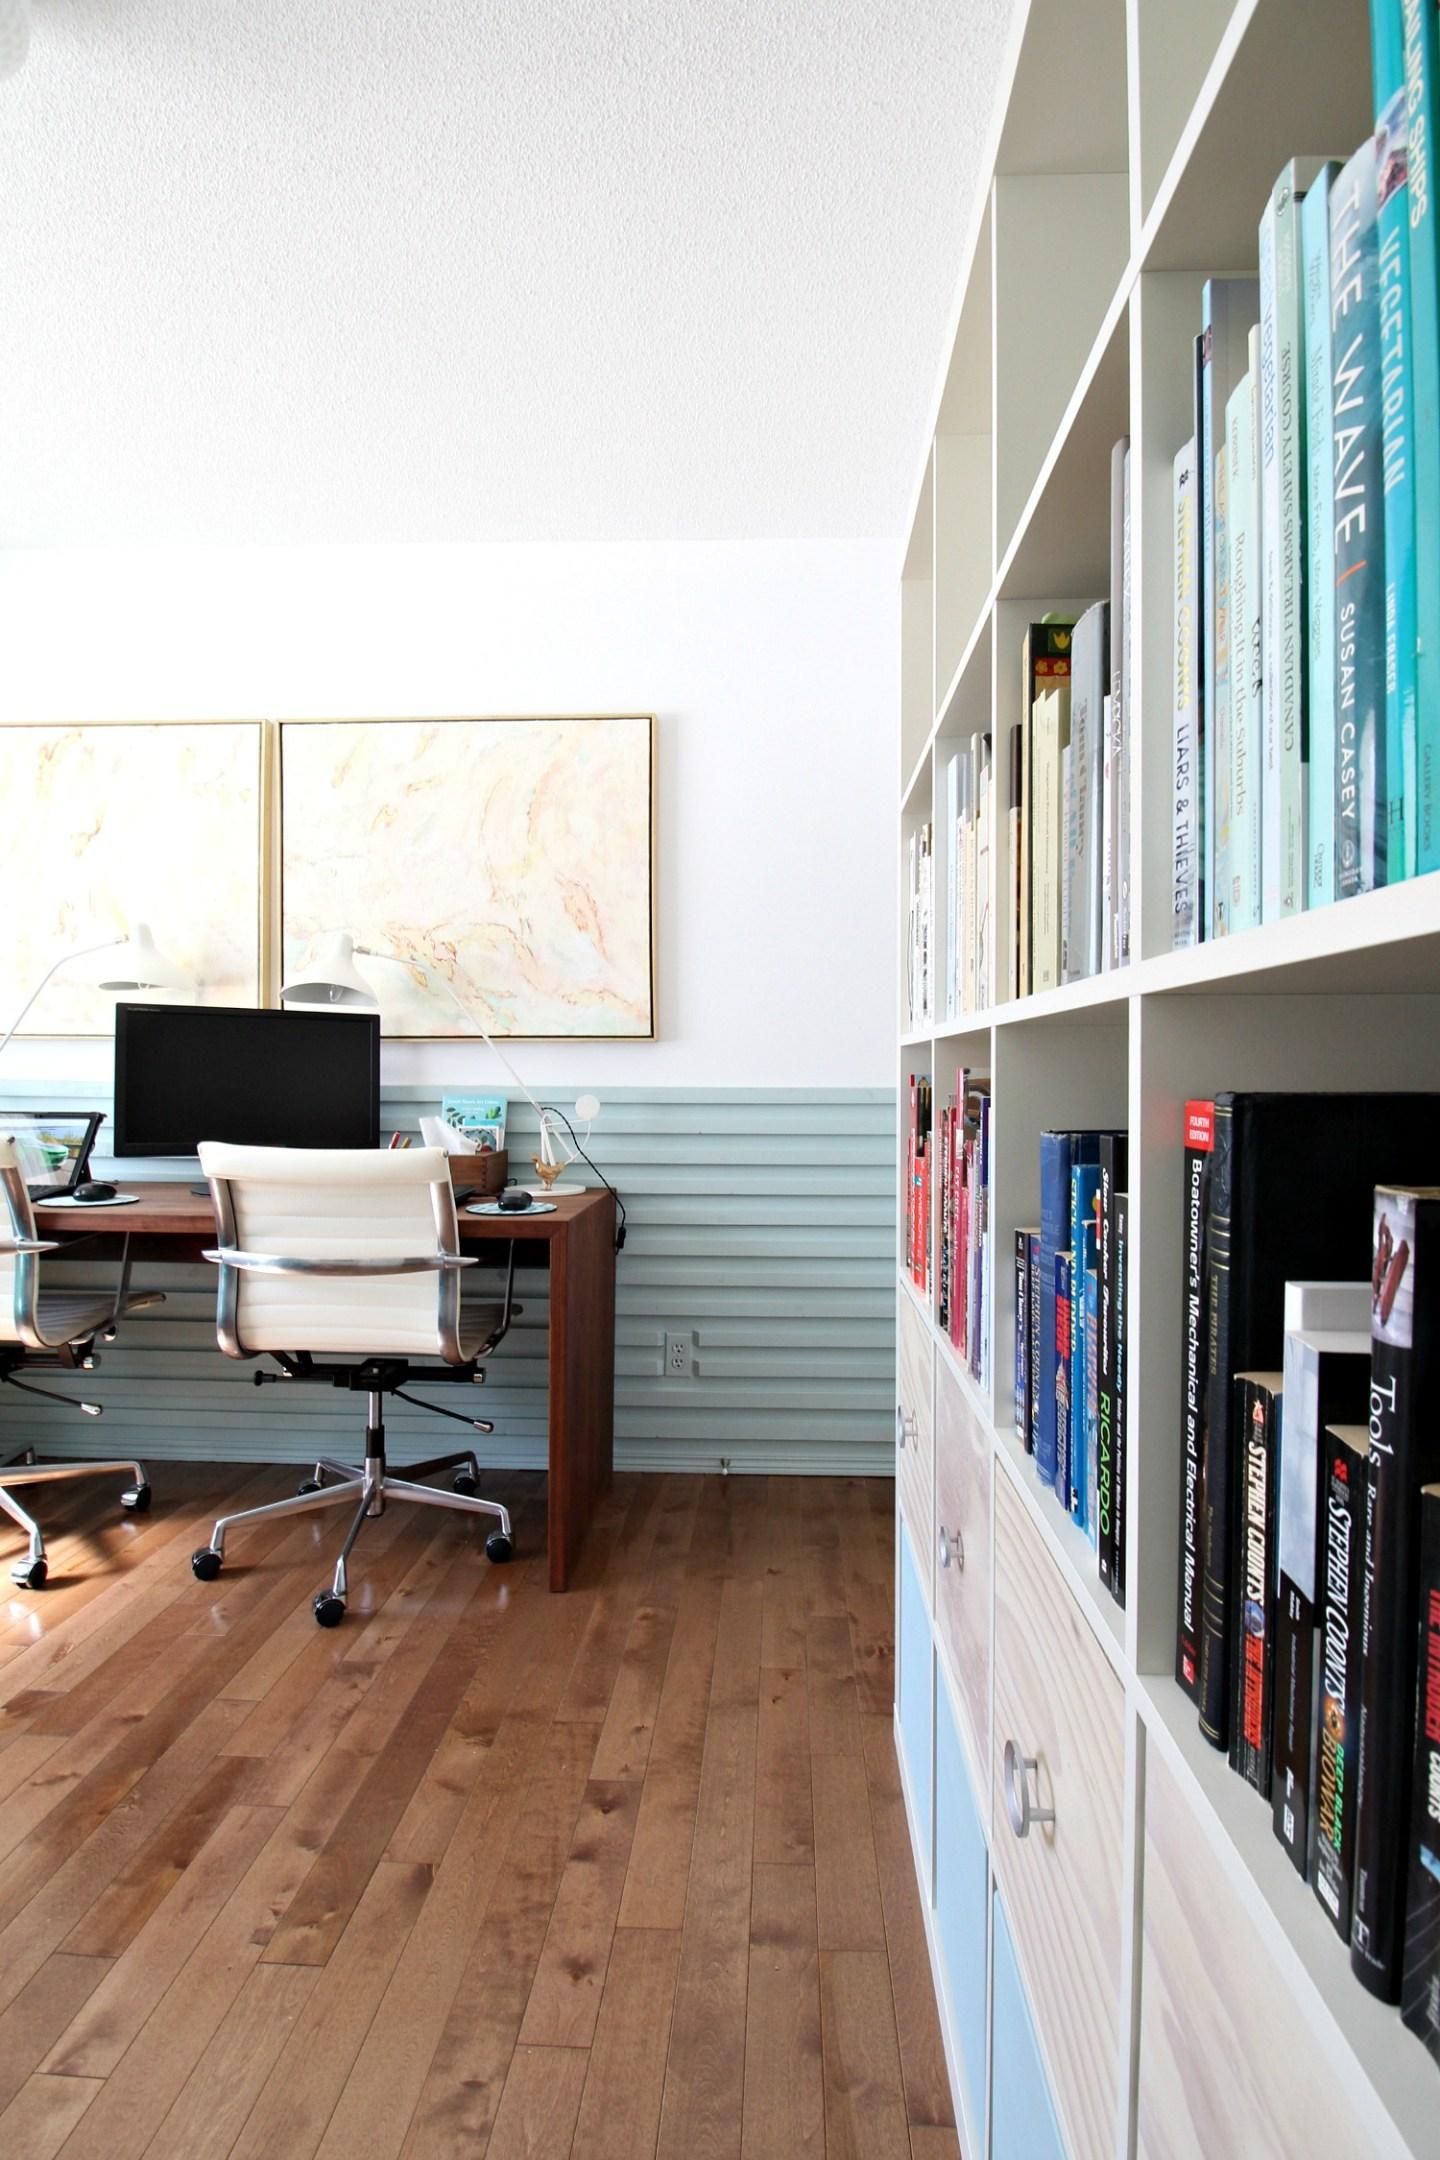 DIY Wood Slat Wall Tutorial